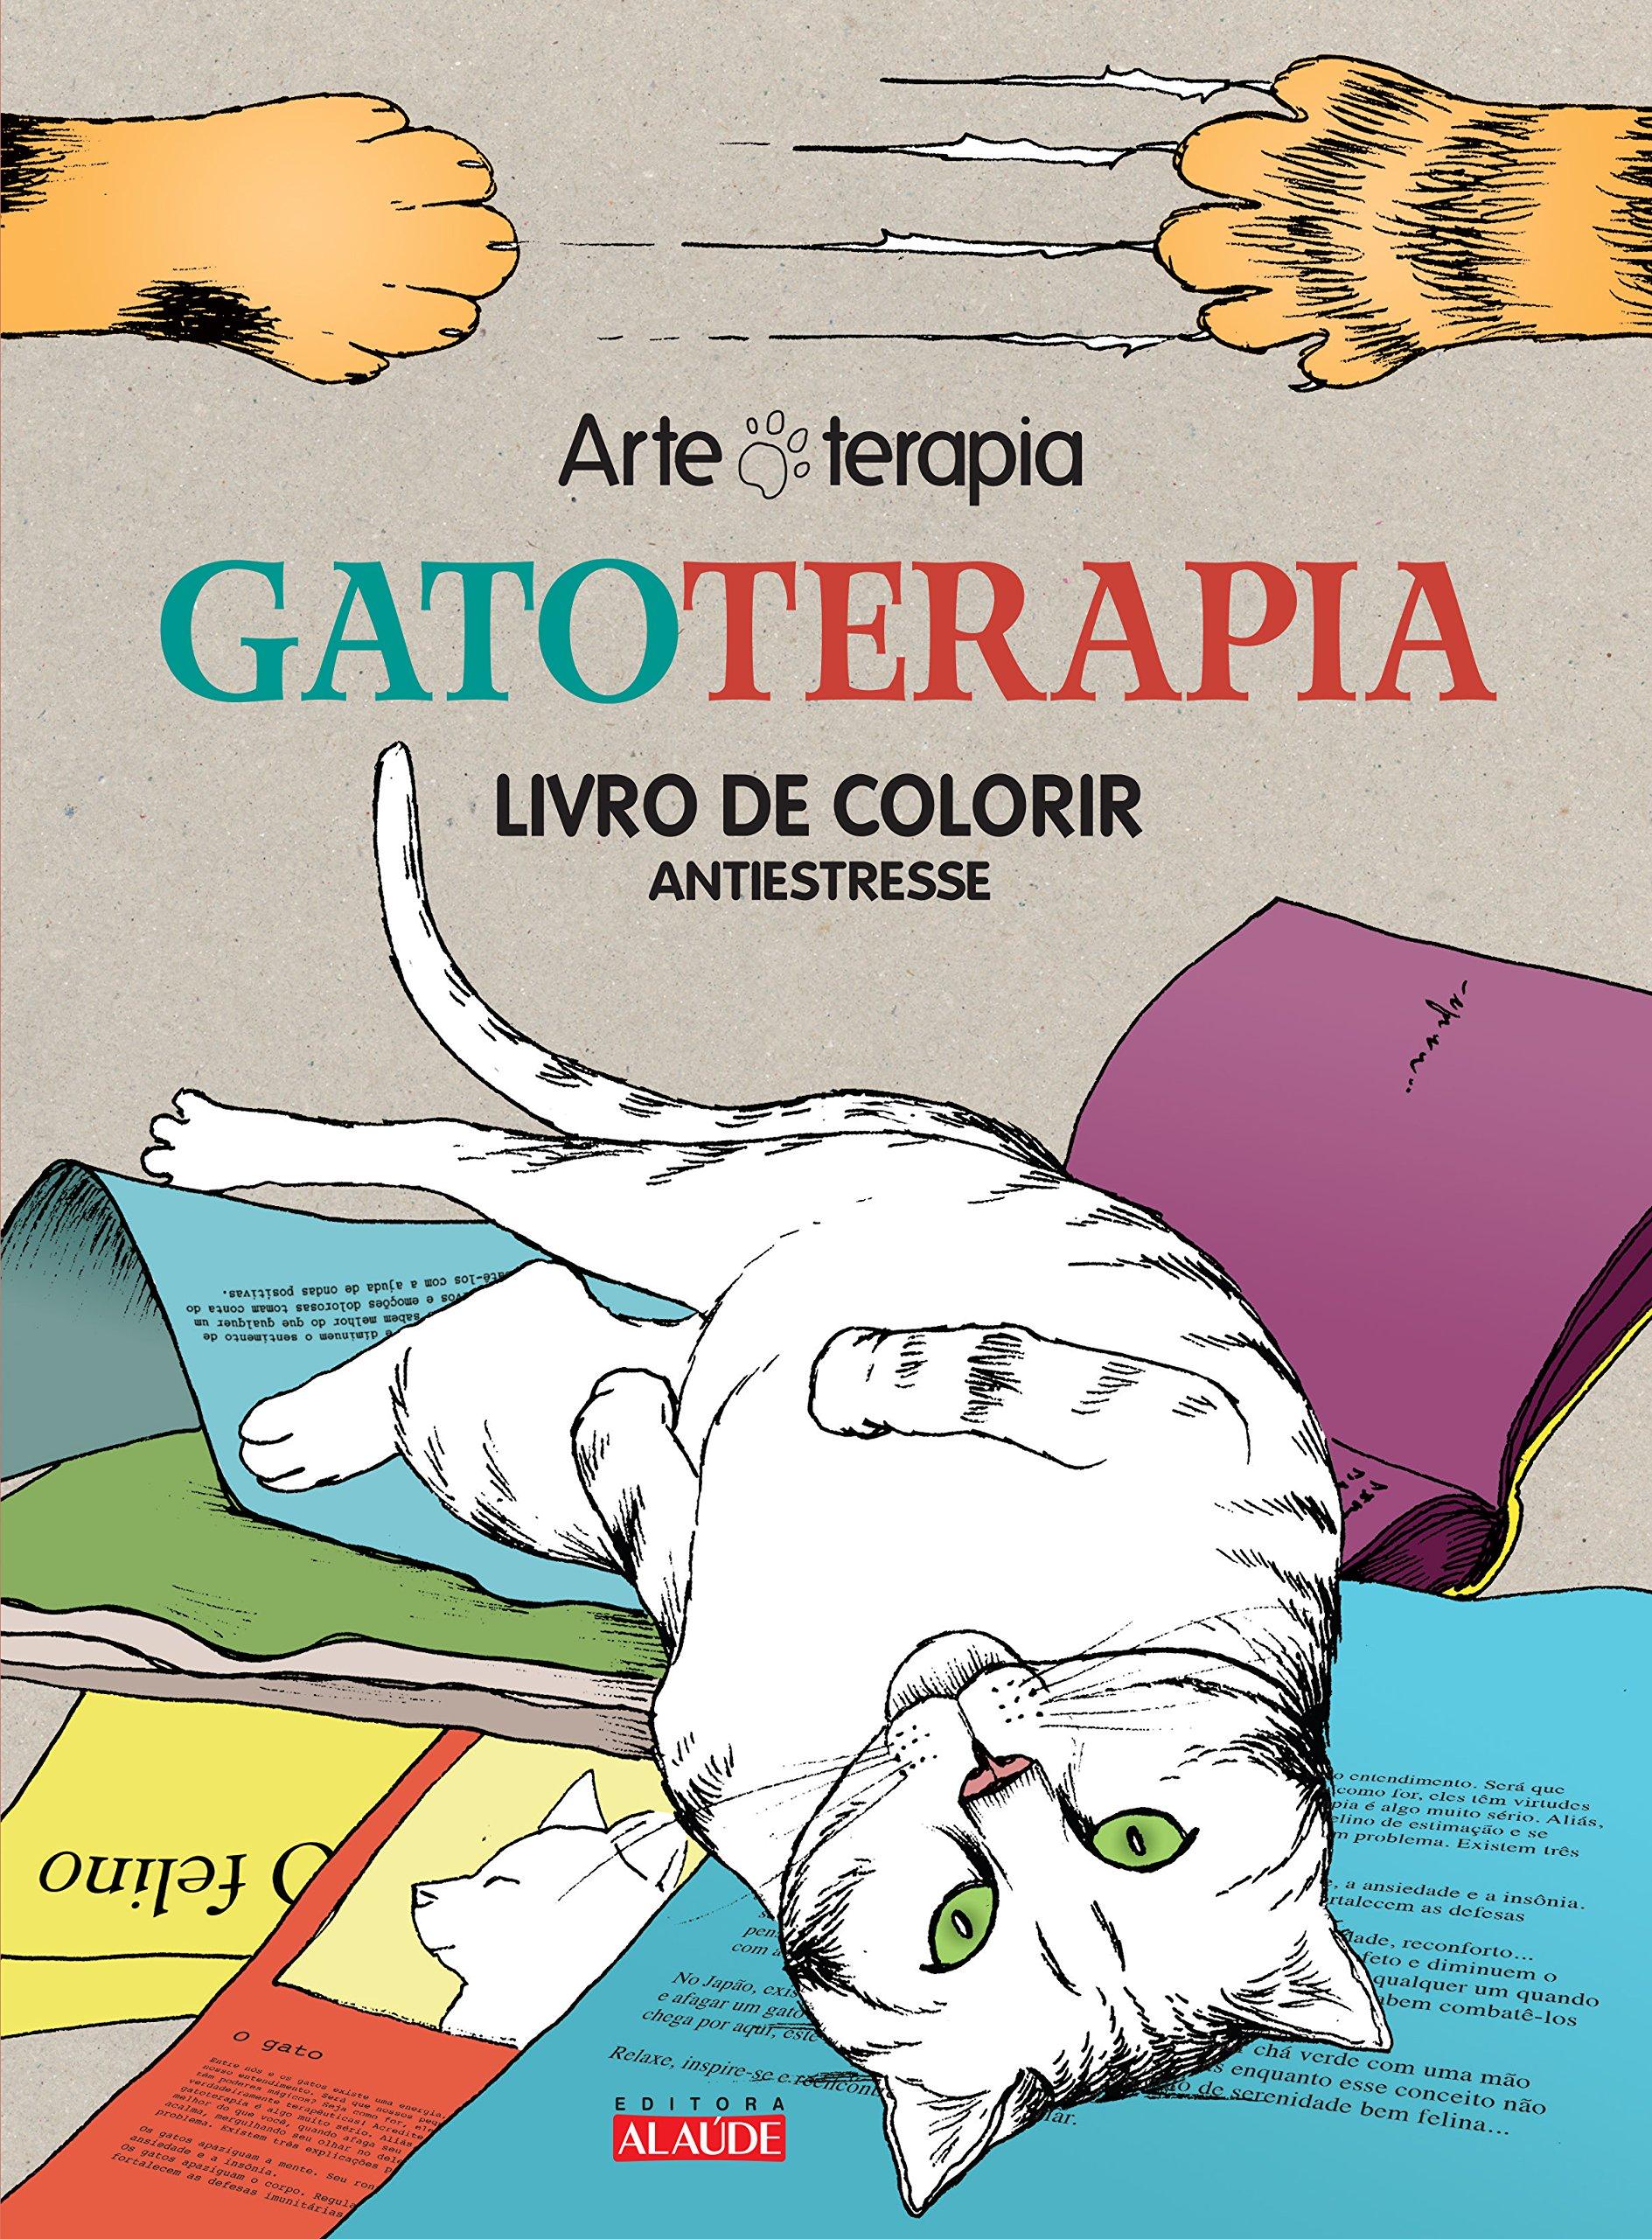 Gatoterapia: Livro de Colorir - Antiestresse (Em Portugues do Brasil): Mademoiselle Eve: 9788578812935: Amazon.com: Books